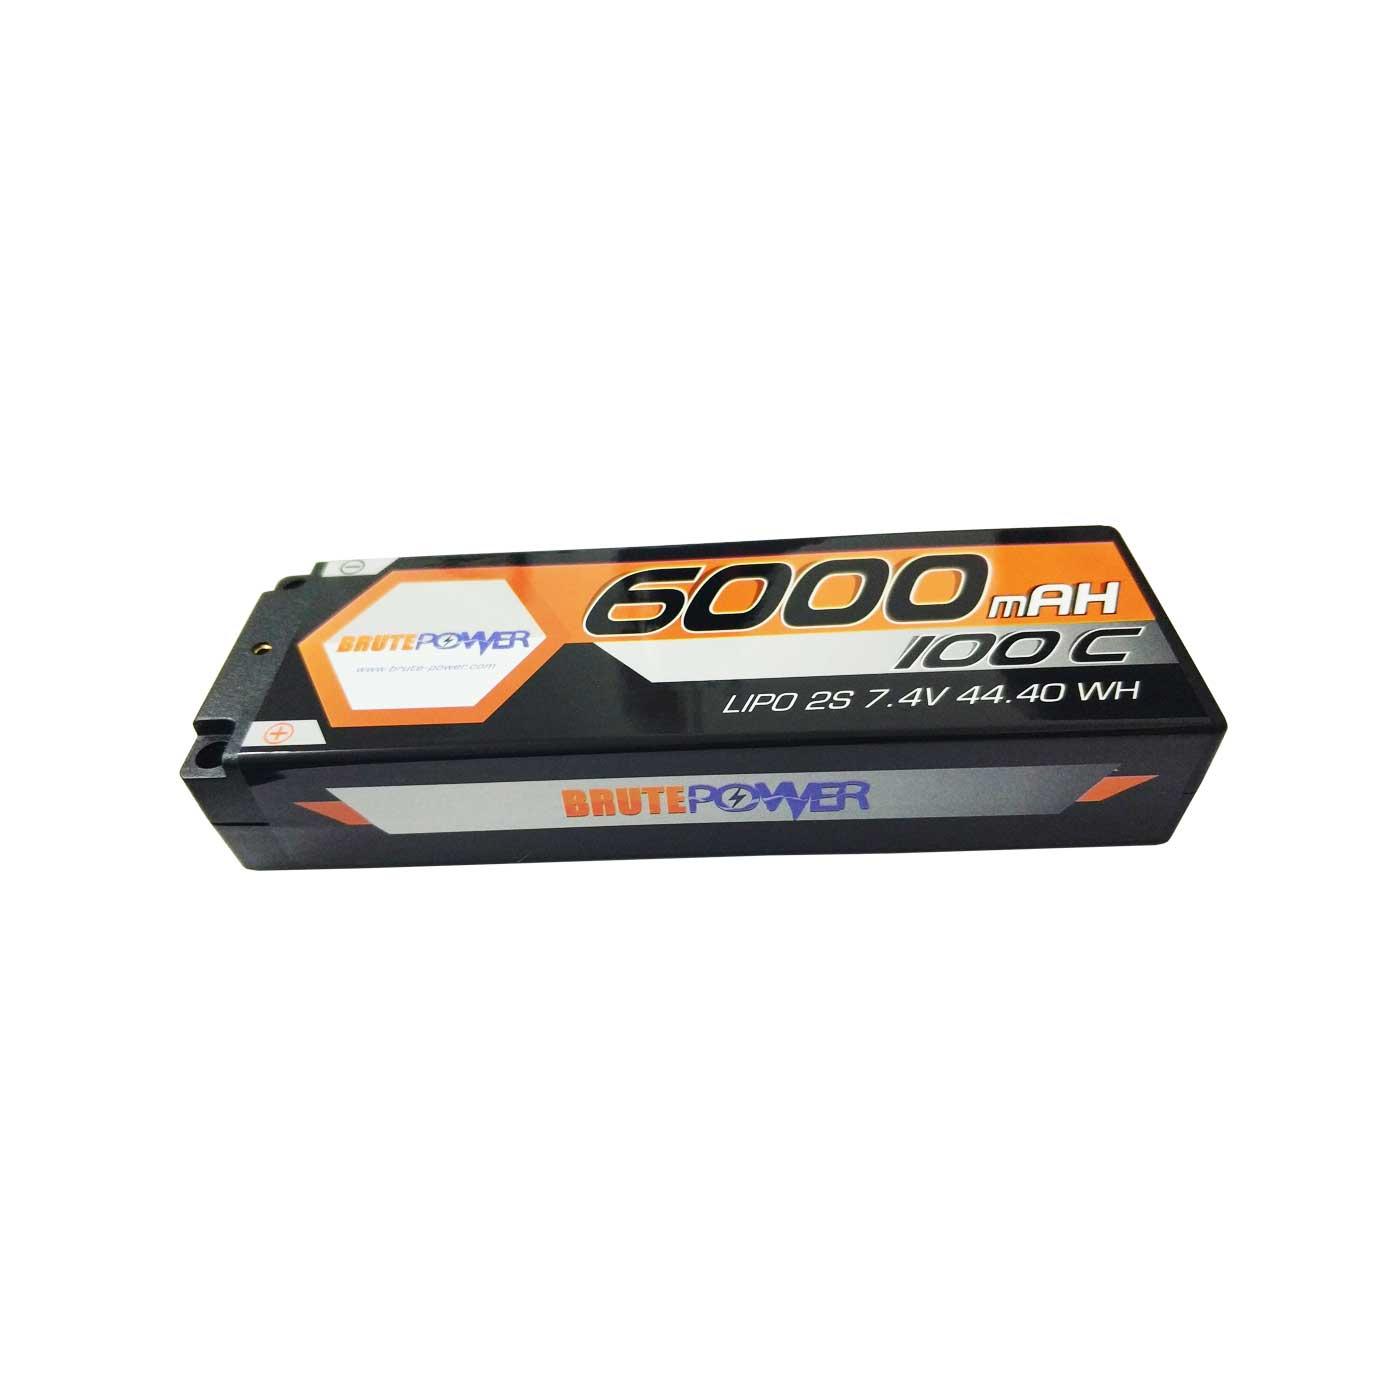 Batería LIPO Brutepower 2S 6000mah 100C